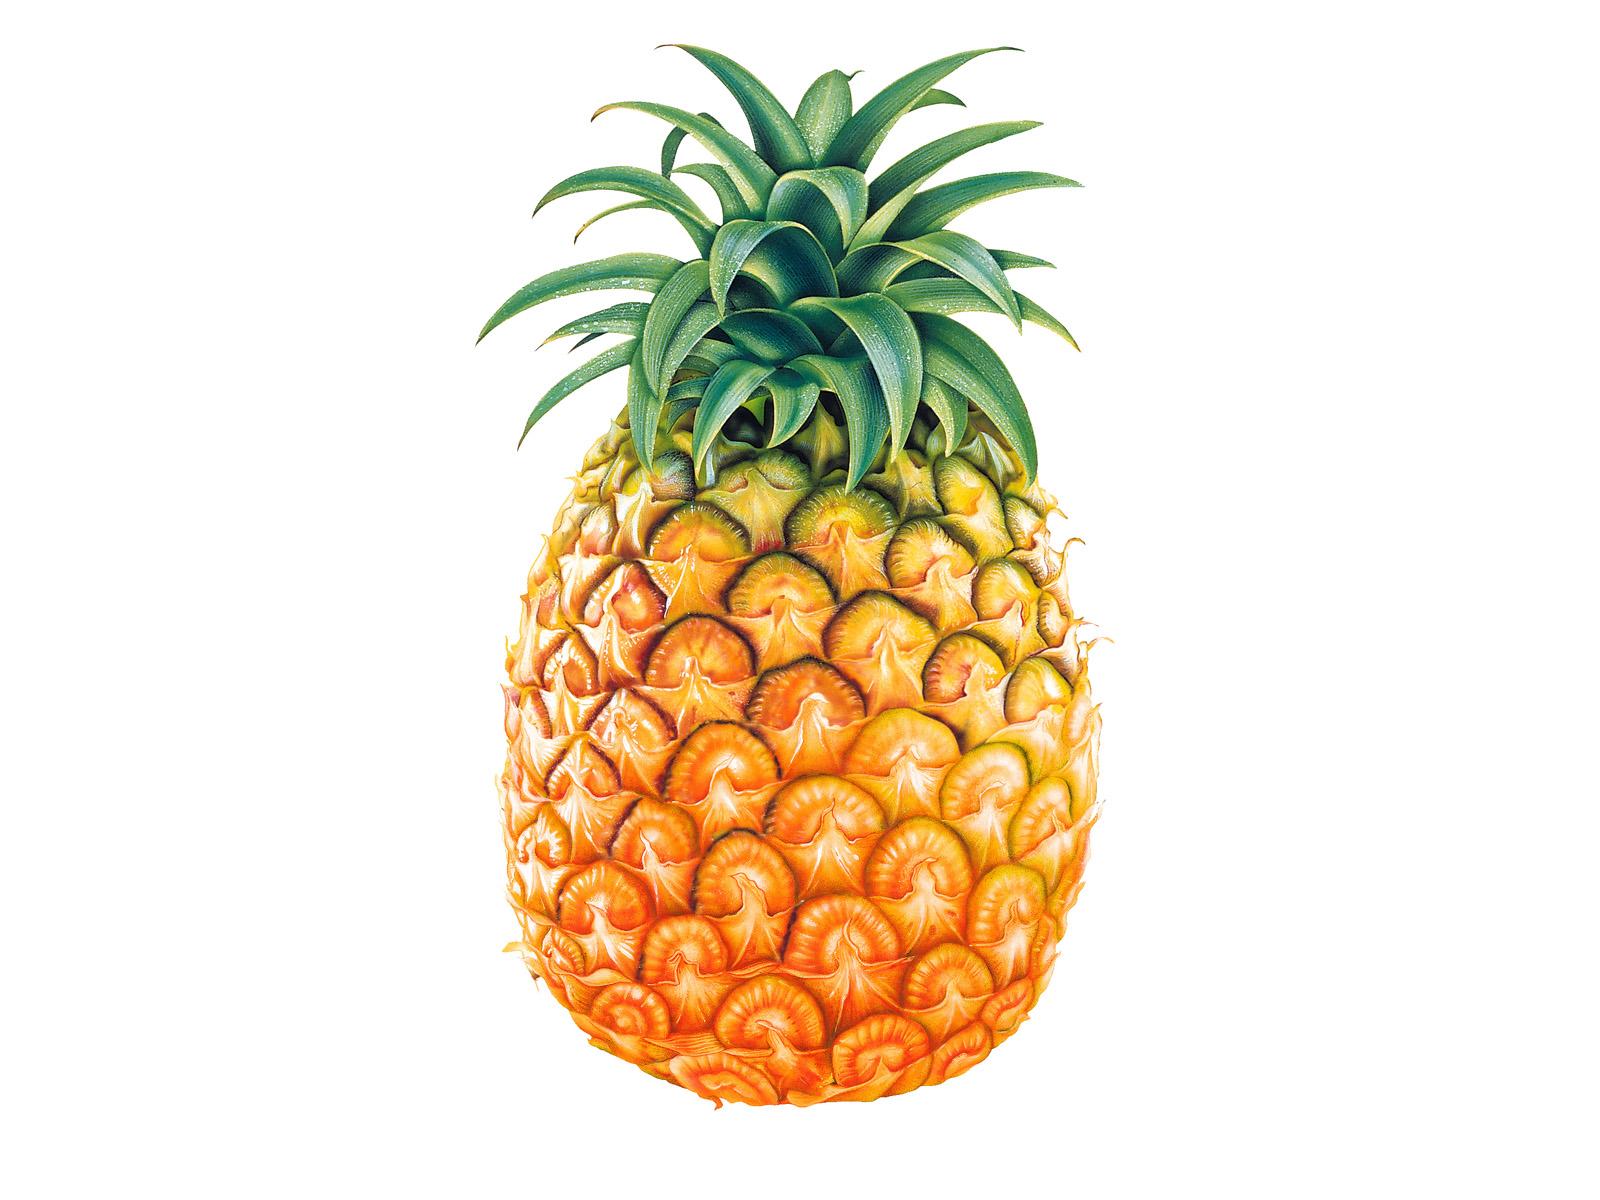 http://2.bp.blogspot.com/_fIIBIseadYg/TFFw6D7aWUI/AAAAAAAAAVY/cE72ali8-ls/s1600/pinapple-fruit_wallpapers_13079_1600x1200.jpg